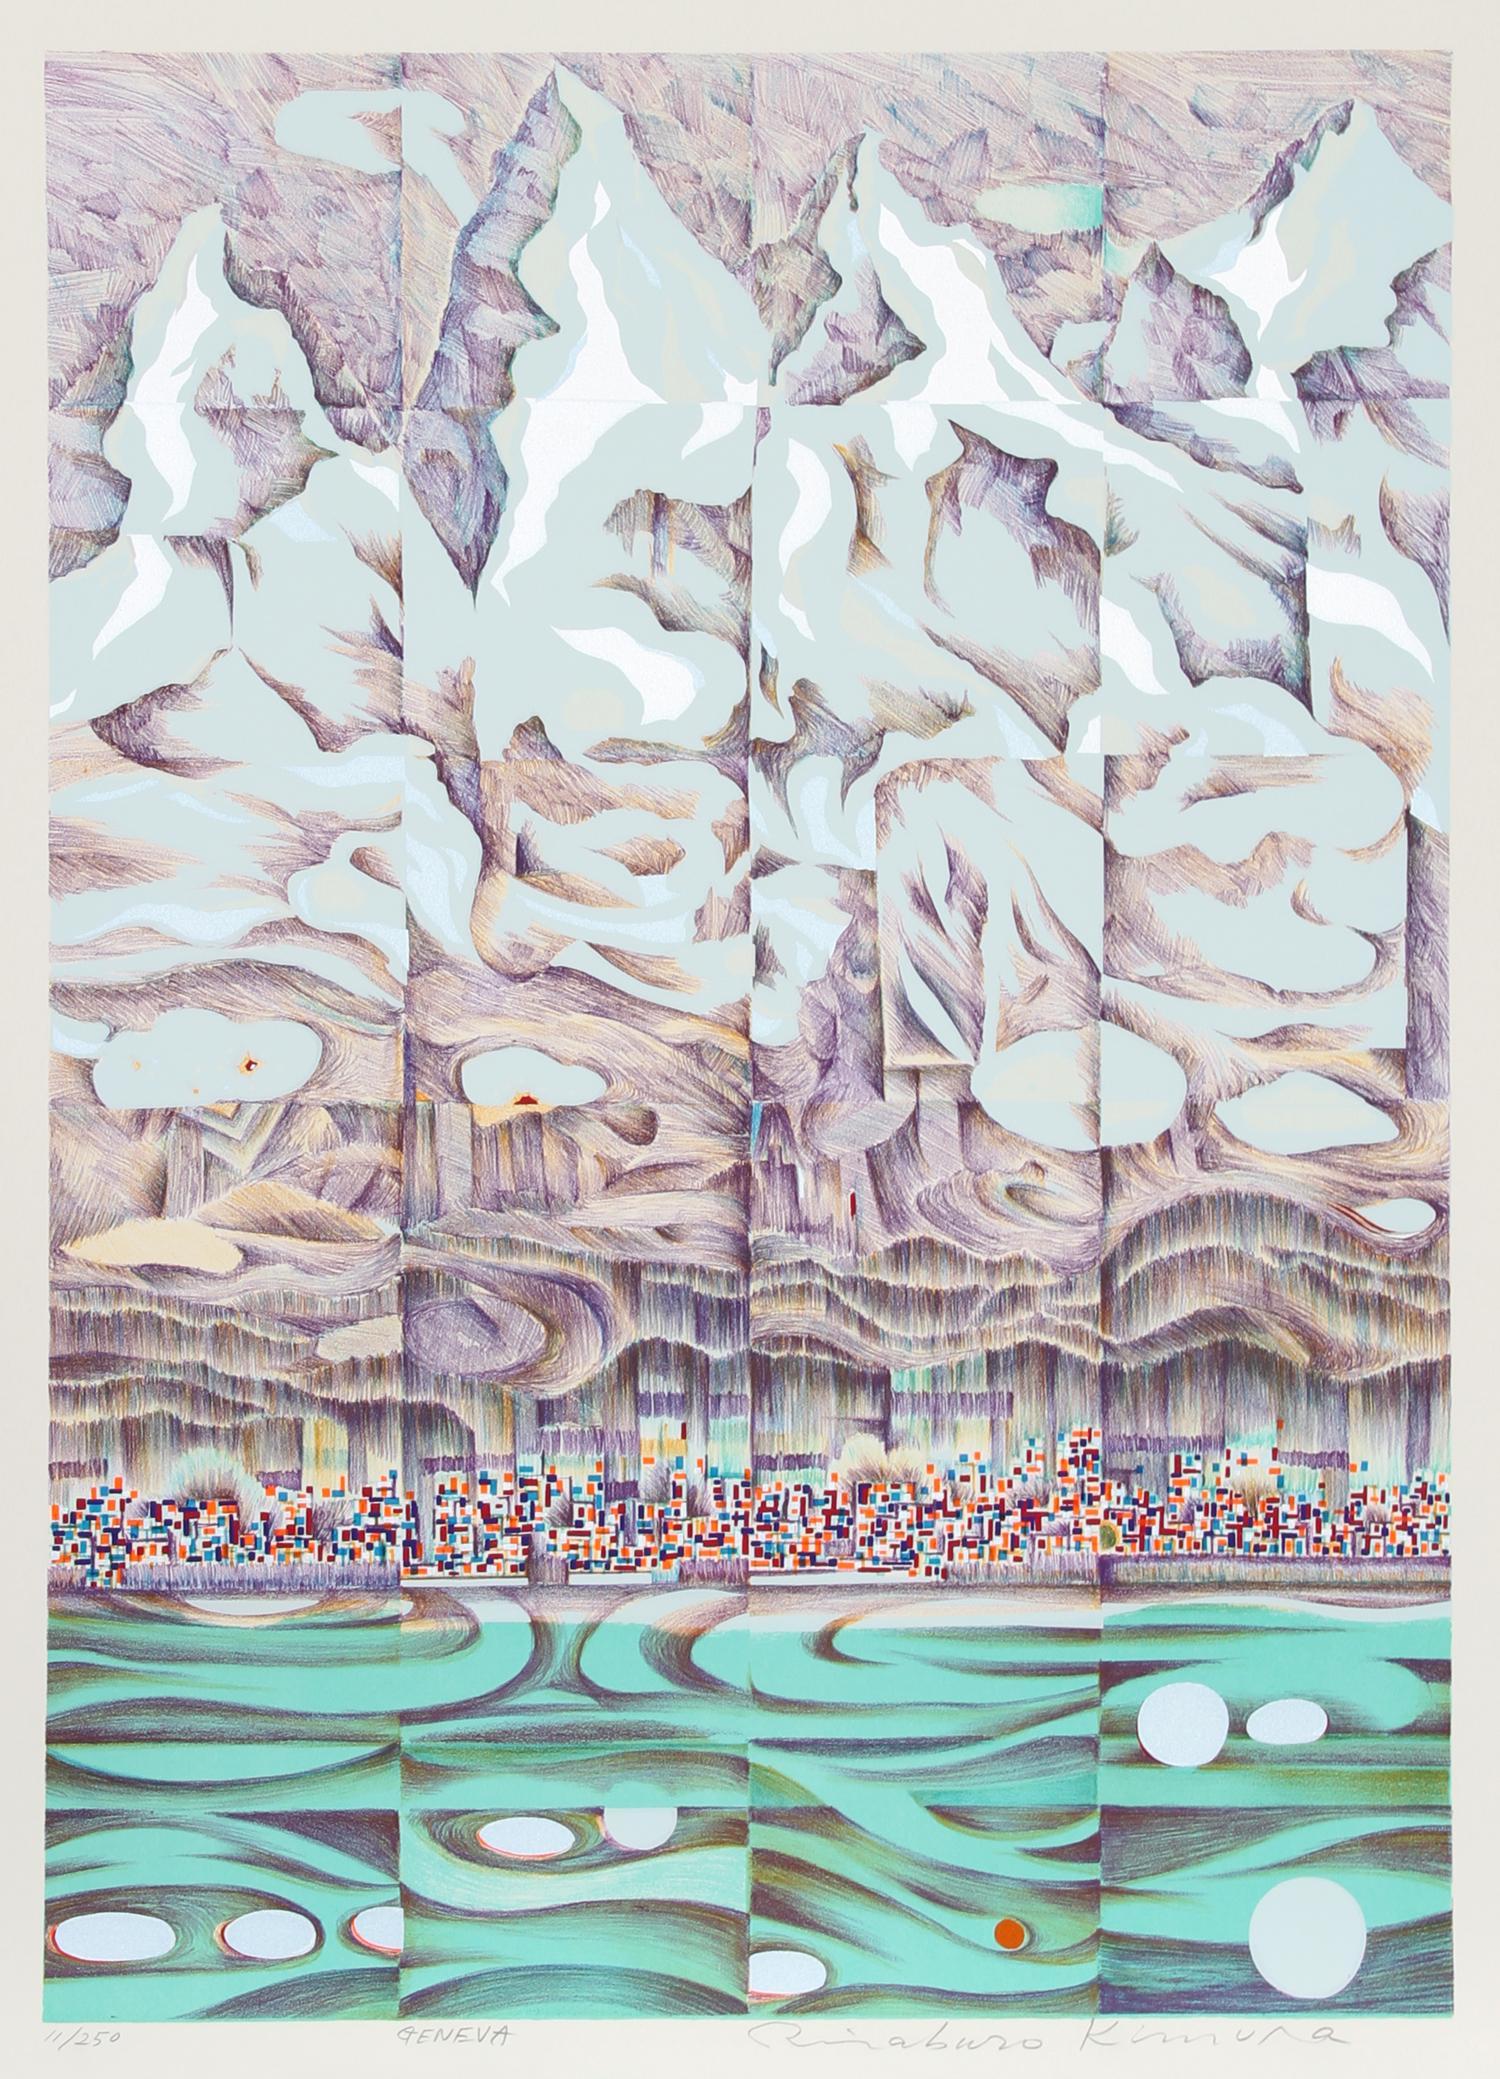 Geneva, 1973 Silkscreen by Risaburo Kimura